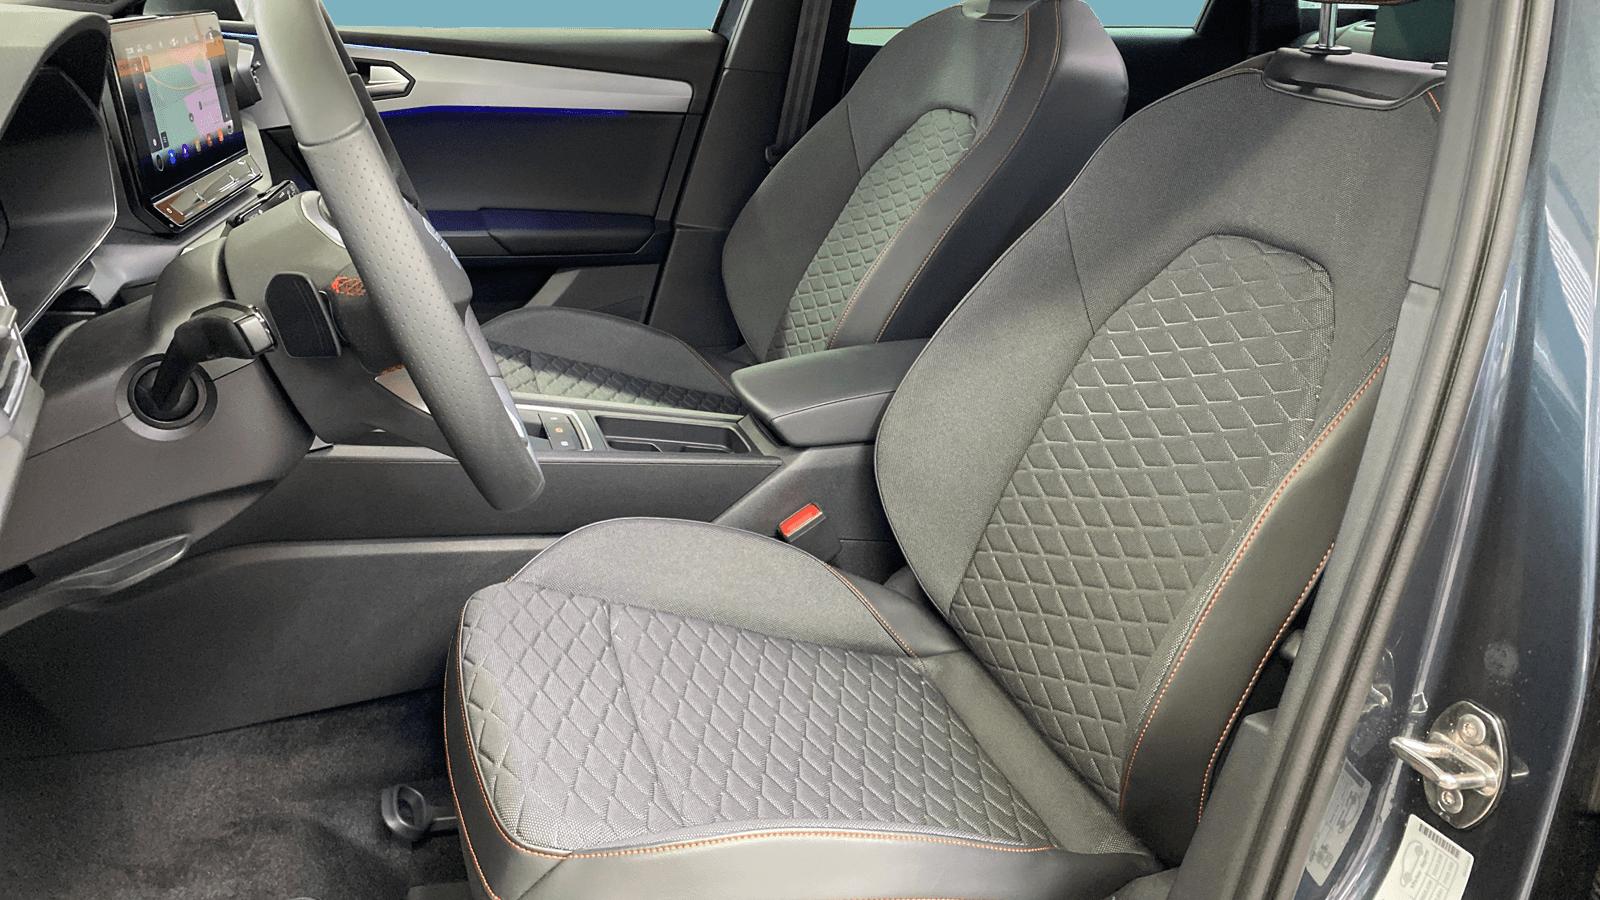 SEAT Leon Sportstourer eTSI Grey interior - Clyde car subscription